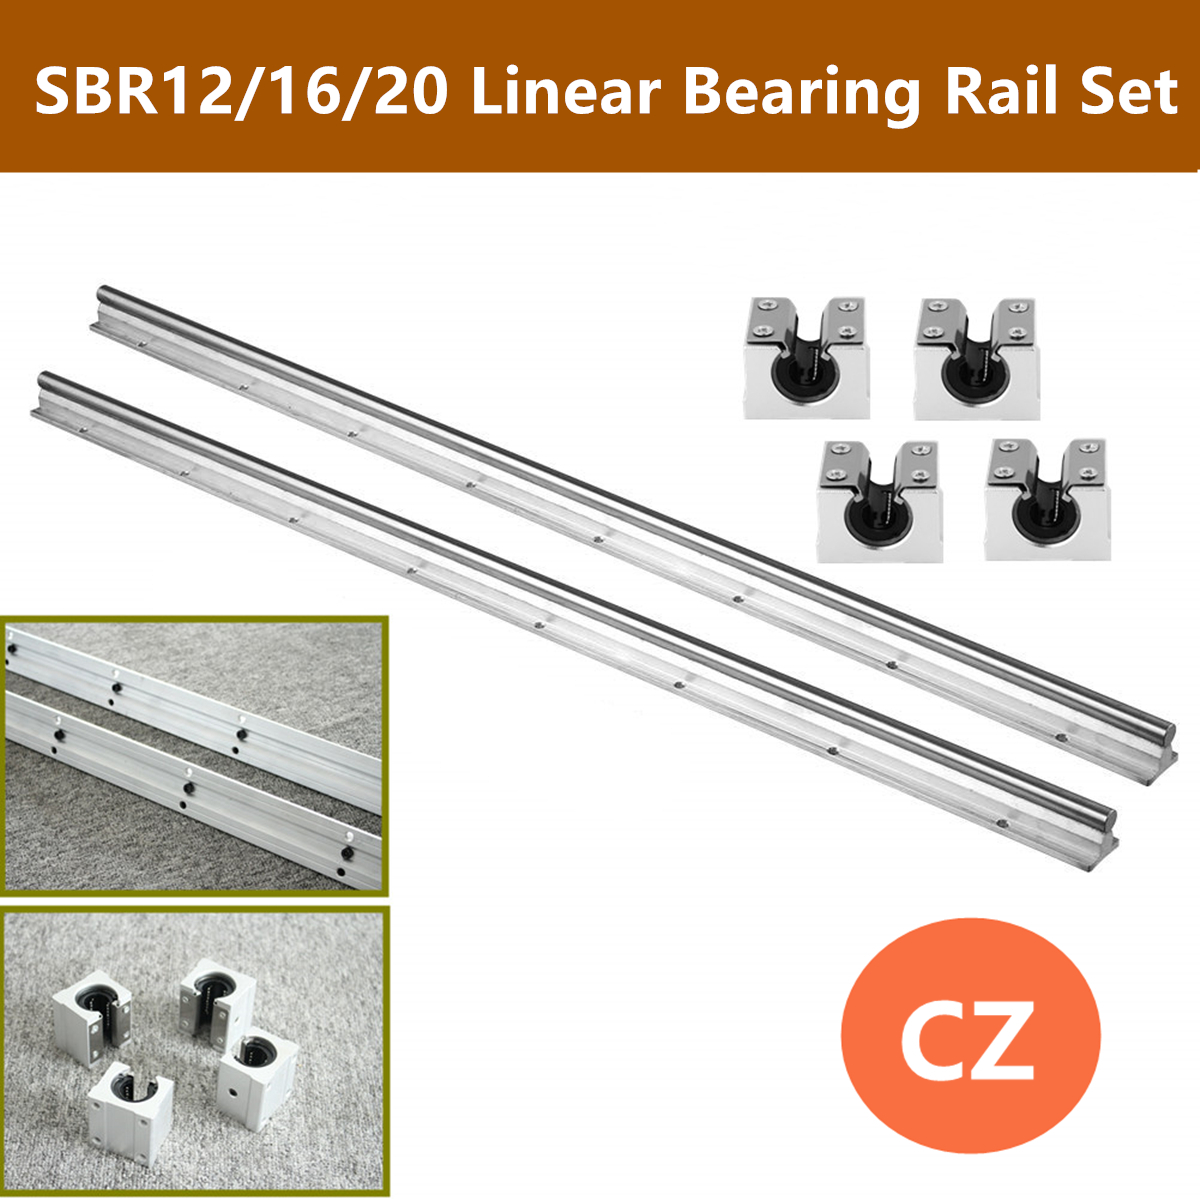 2Pcs SBR12/16/20 200mm-1500mm 12MM 16MM 20MM Linear Bearing Rail Slide Guide Shaft + 4Pcs SBR12UU/SBR16UU/SBR20UU Blocks